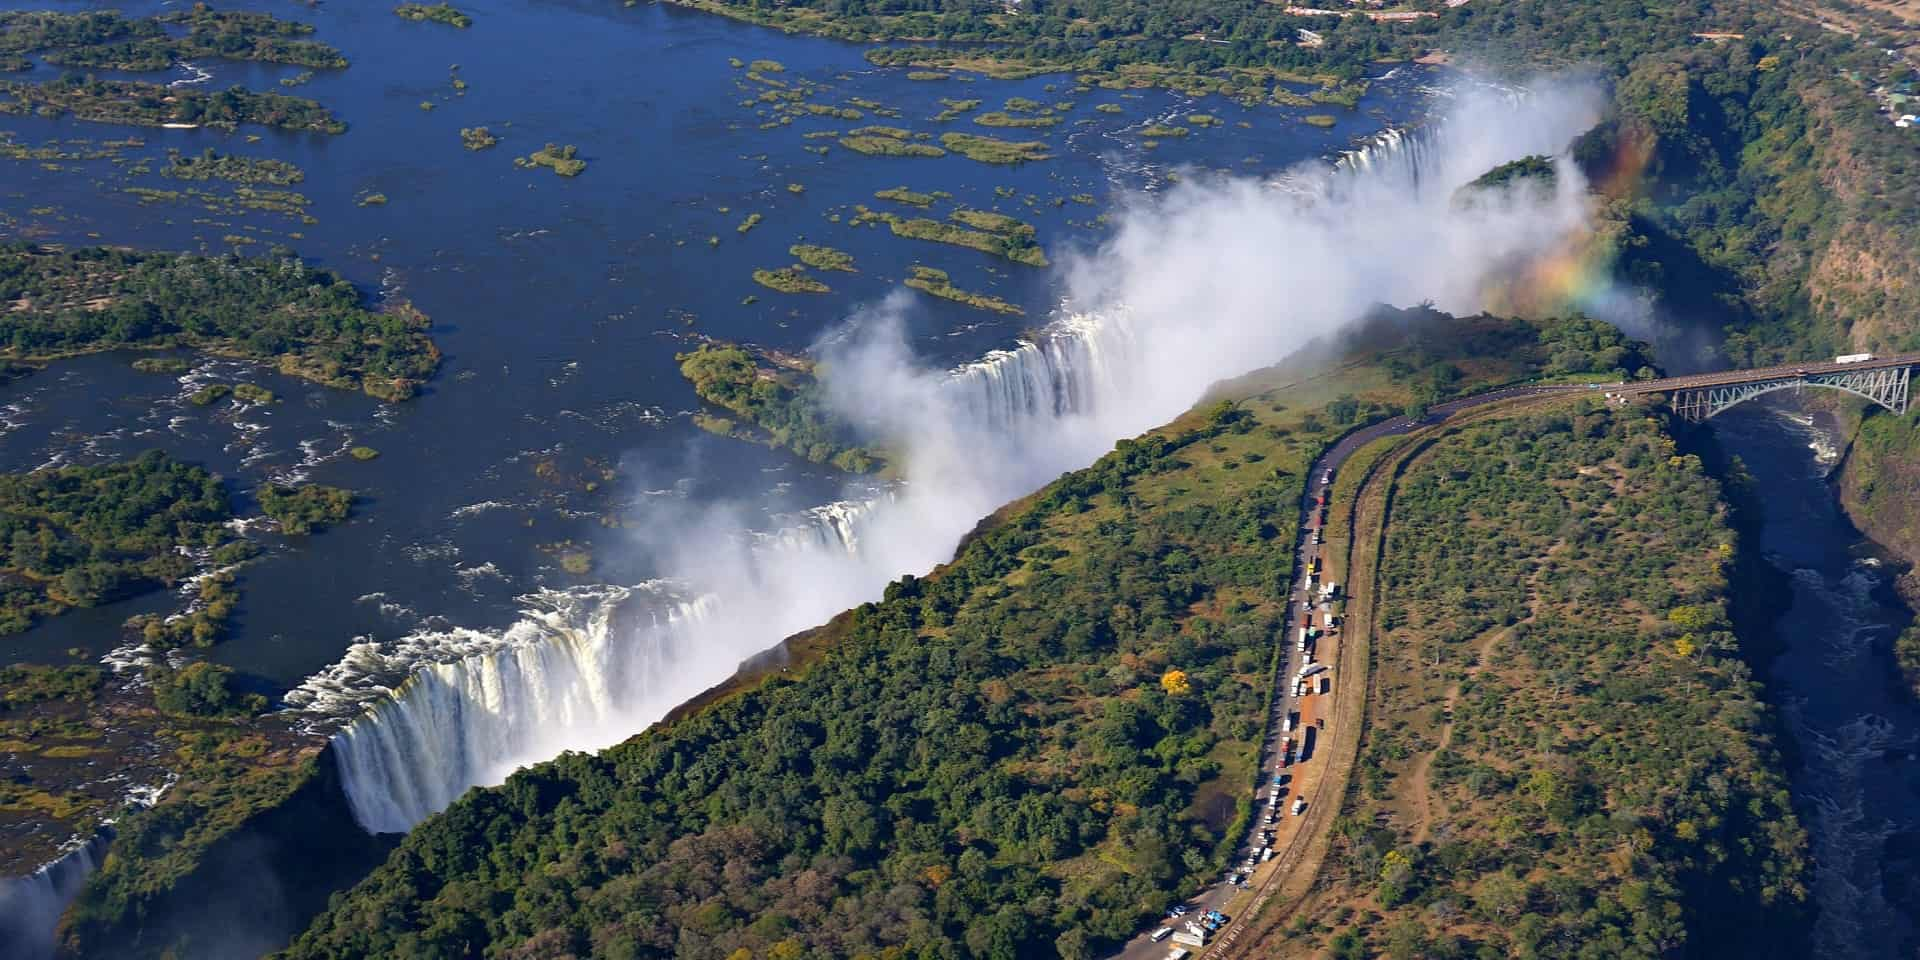 Туры в Зимбабве. Водопад Виктория фото